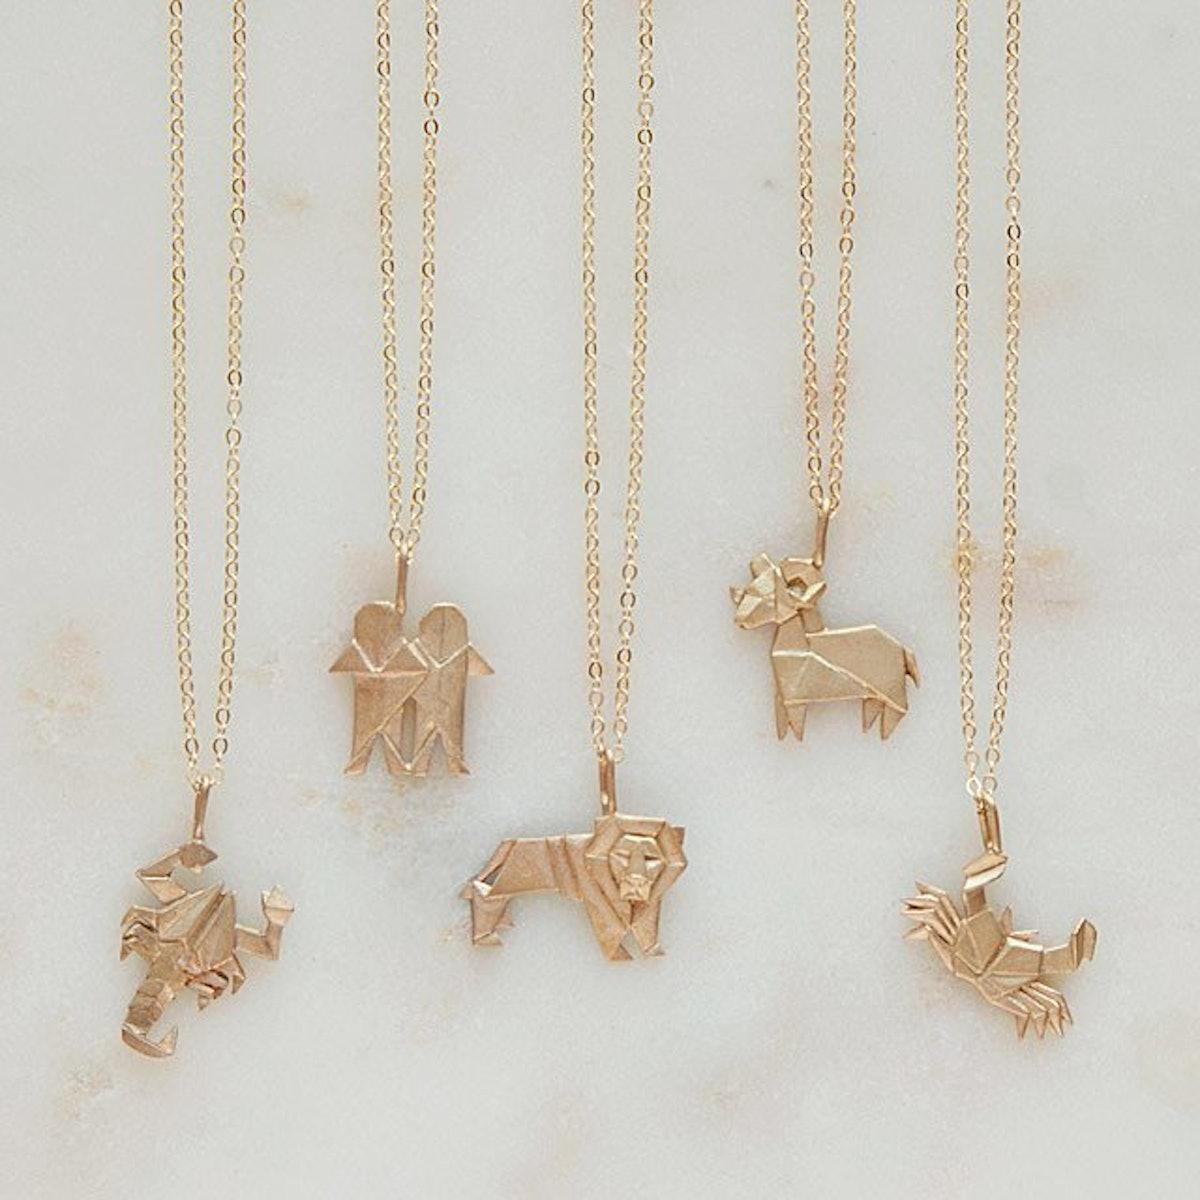 Uncommon Goods Origami Zodiac Necklaces